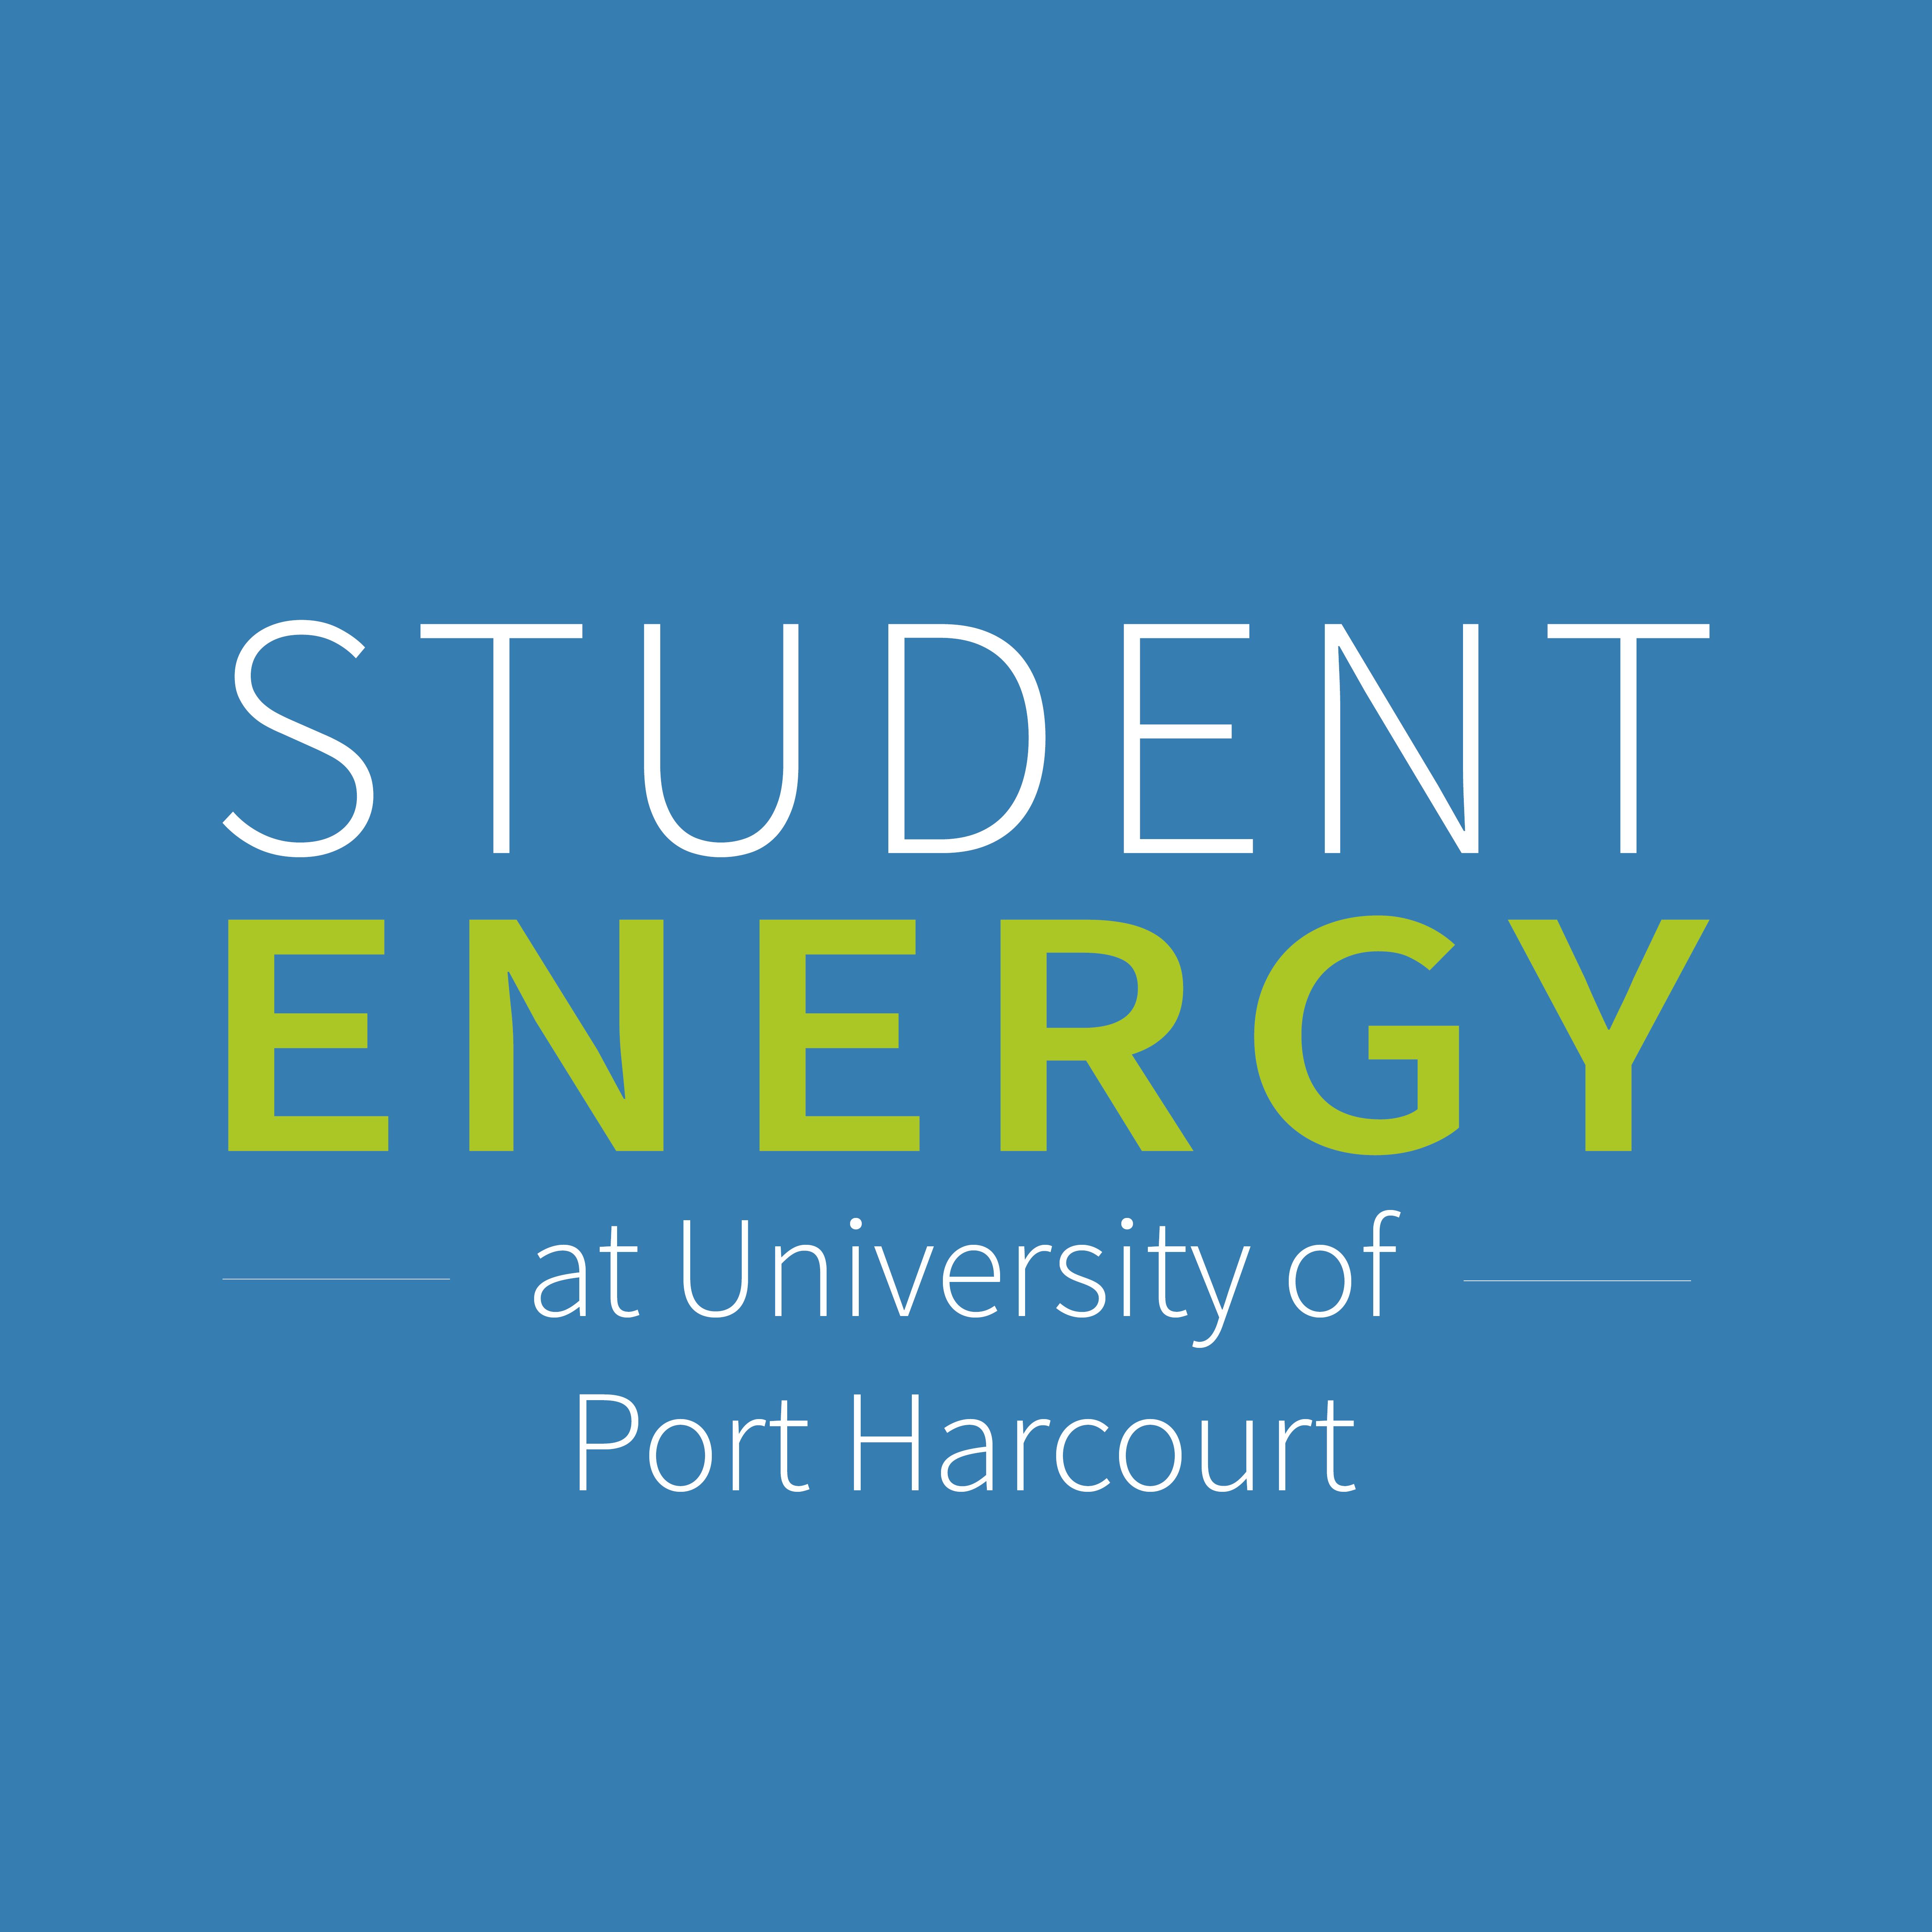 University of Port Harcourt Logo.png